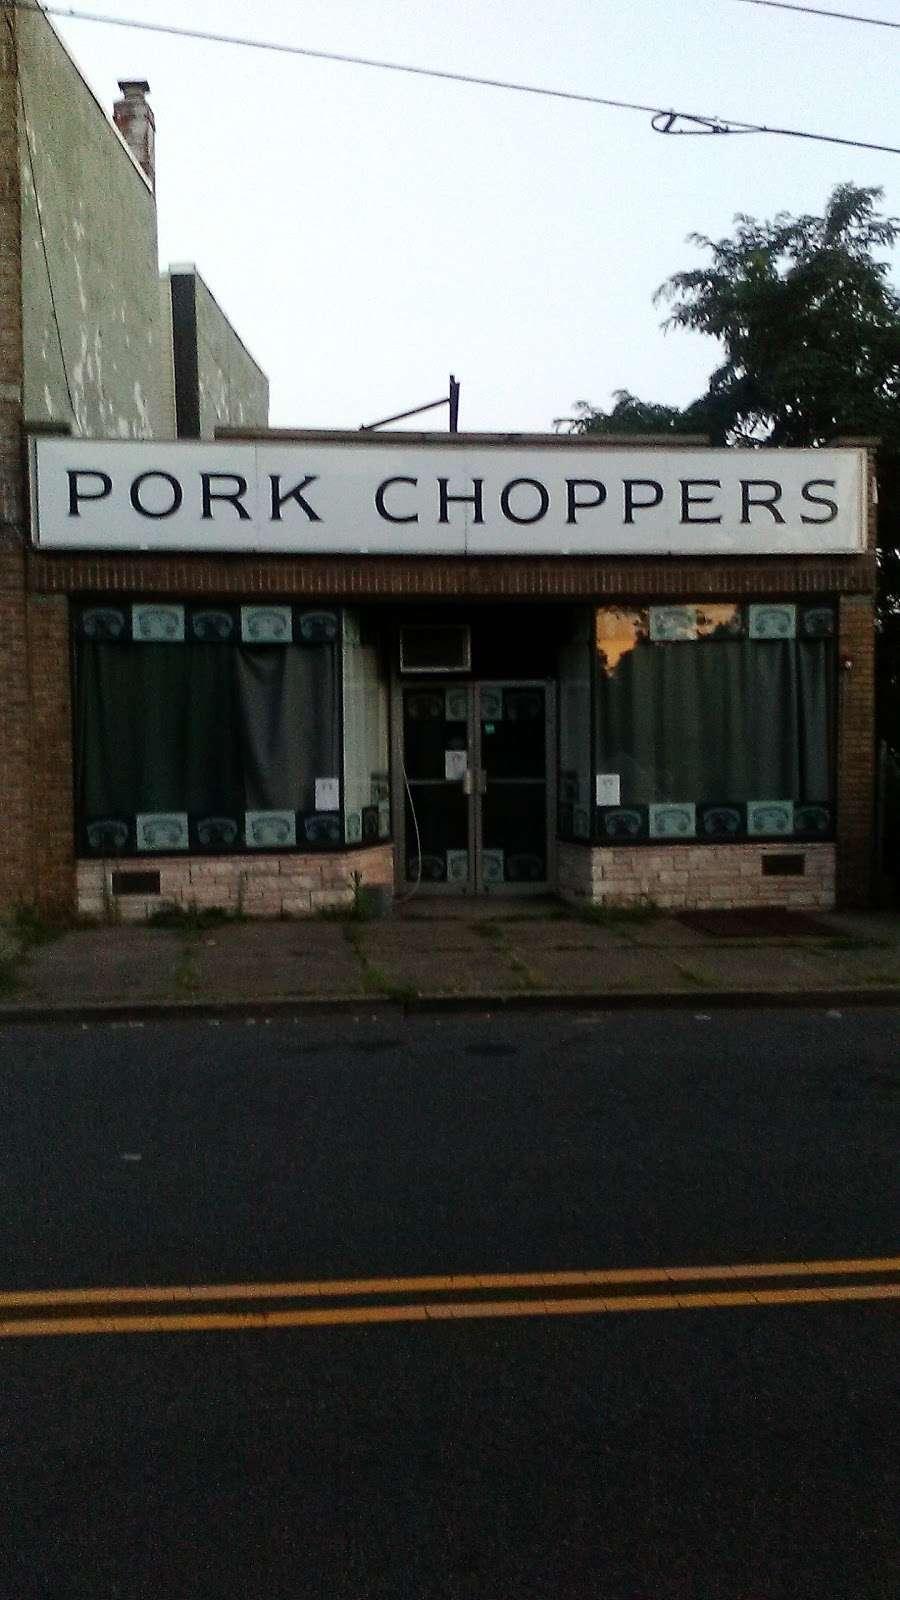 Pork Choppers - store    Photo 1 of 5   Address: 8 Queen Anne Rd, Bogota, NJ 07603, USA   Phone: (201) 473-7373